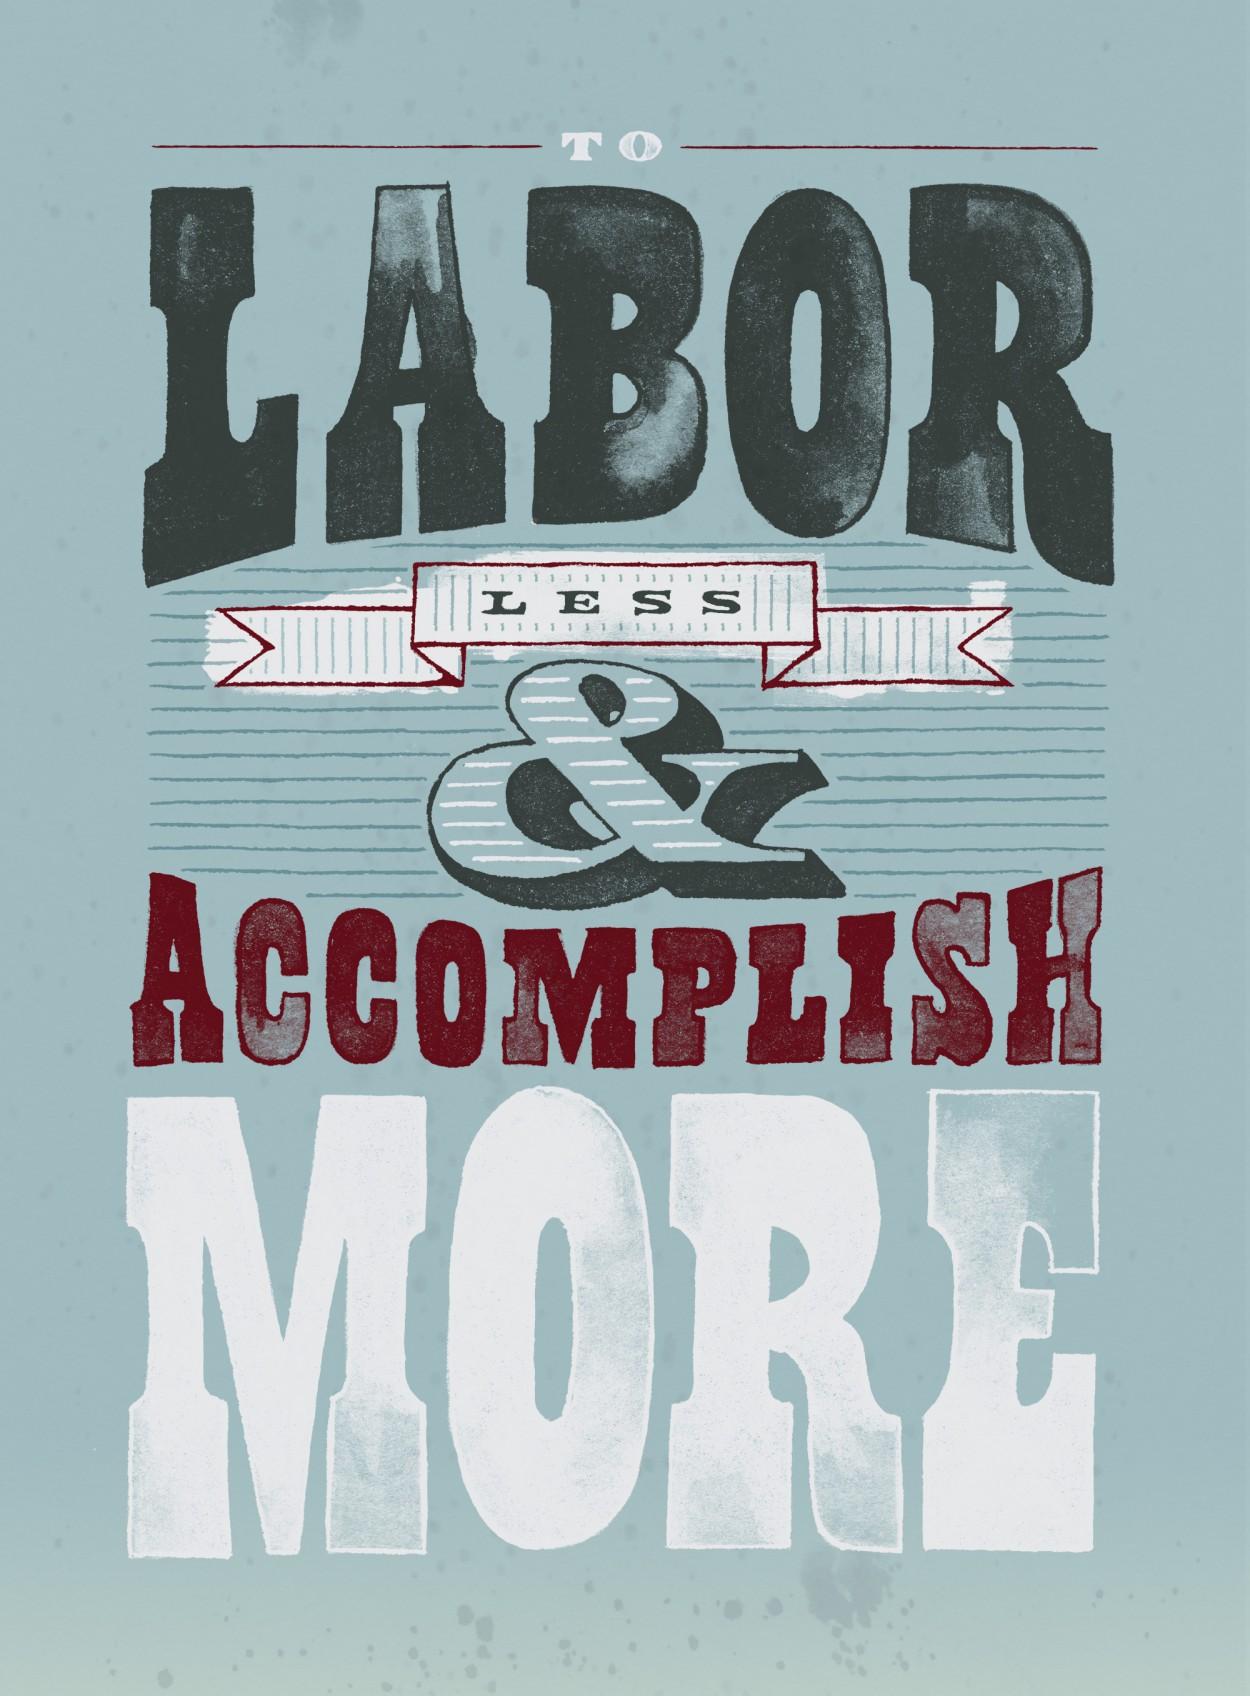 fot-em-labor-less-scan-01i-1250x1696.jpg